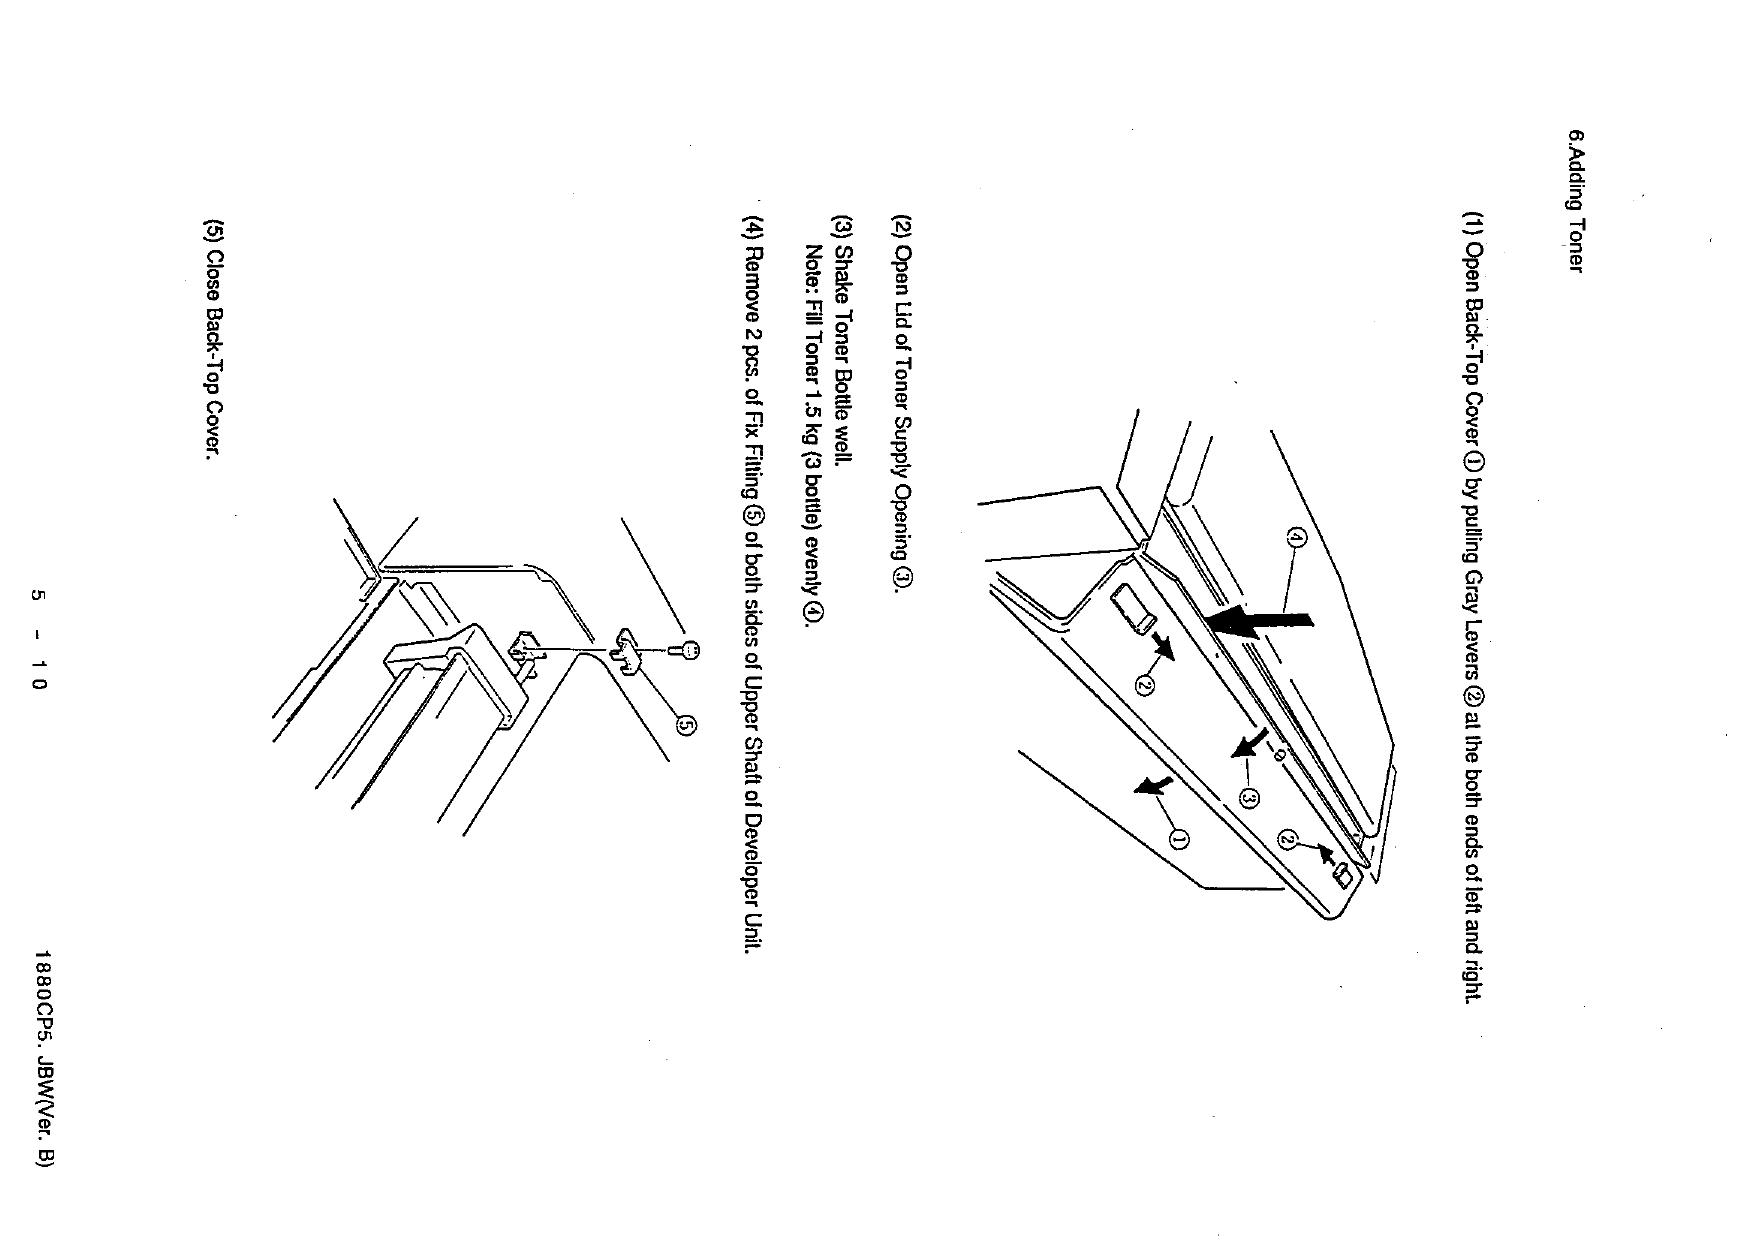 KIP 1880 Service Manual